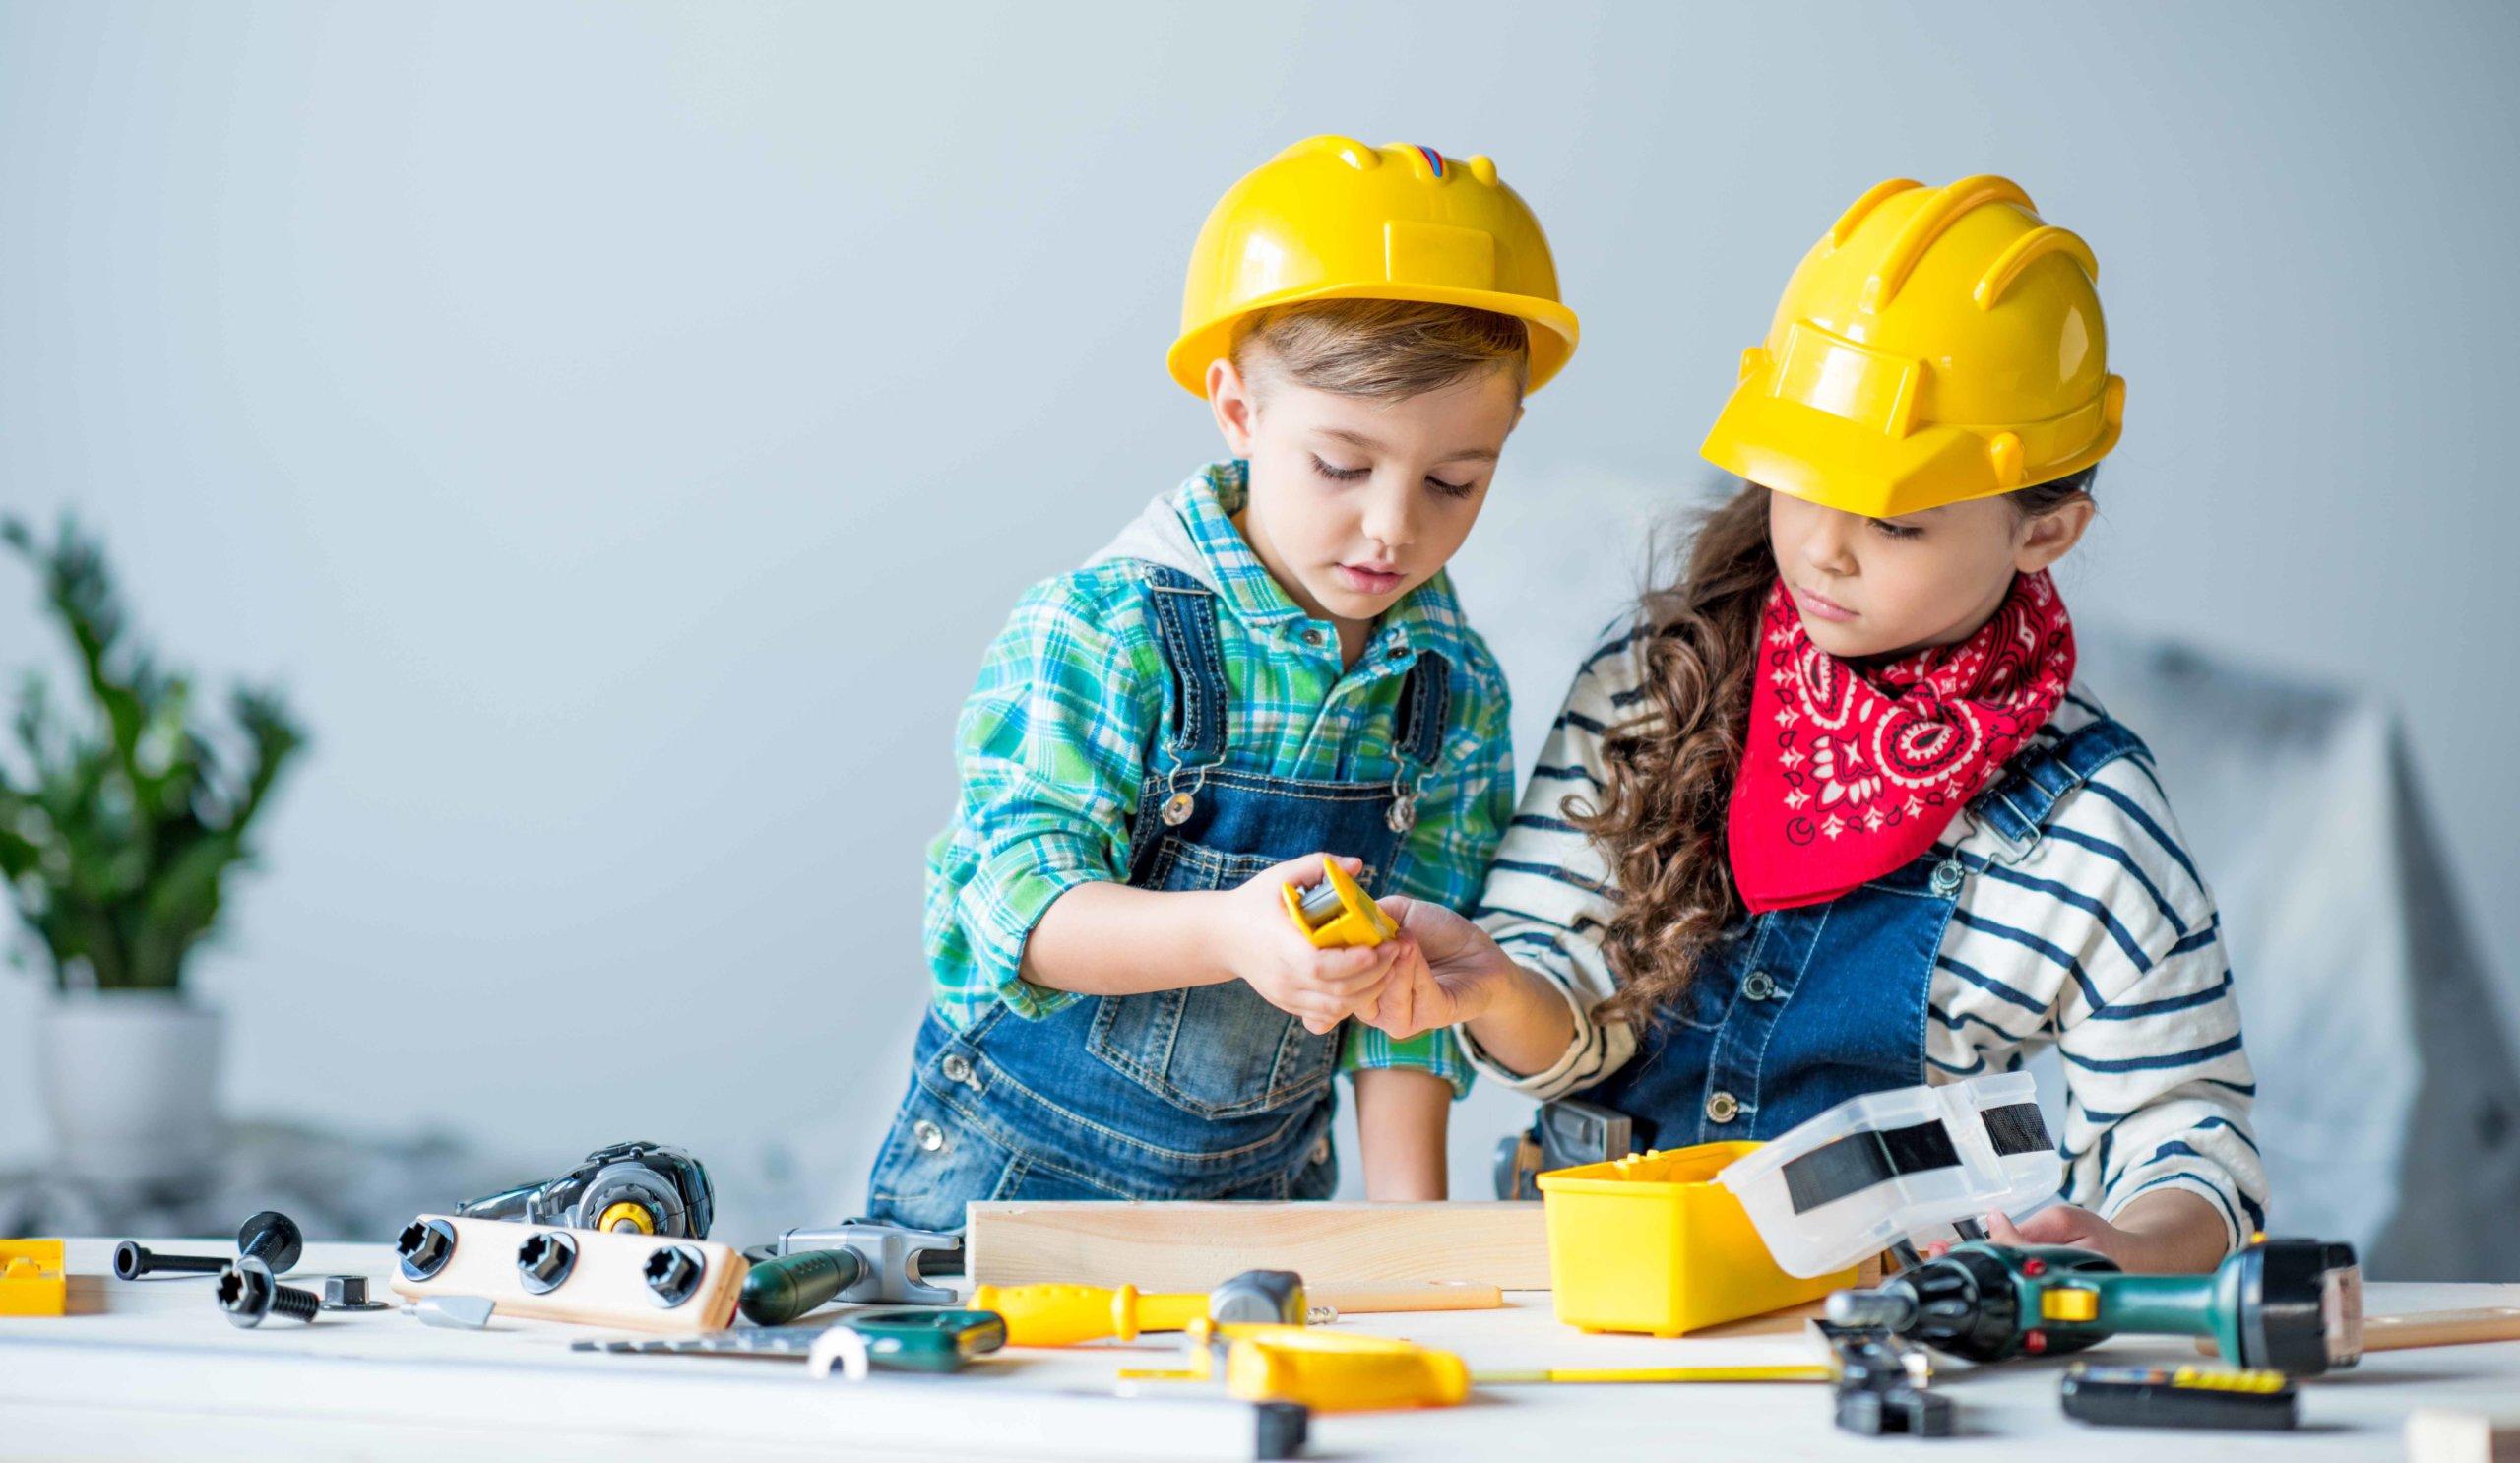 7 Best Bob The Builder Toys